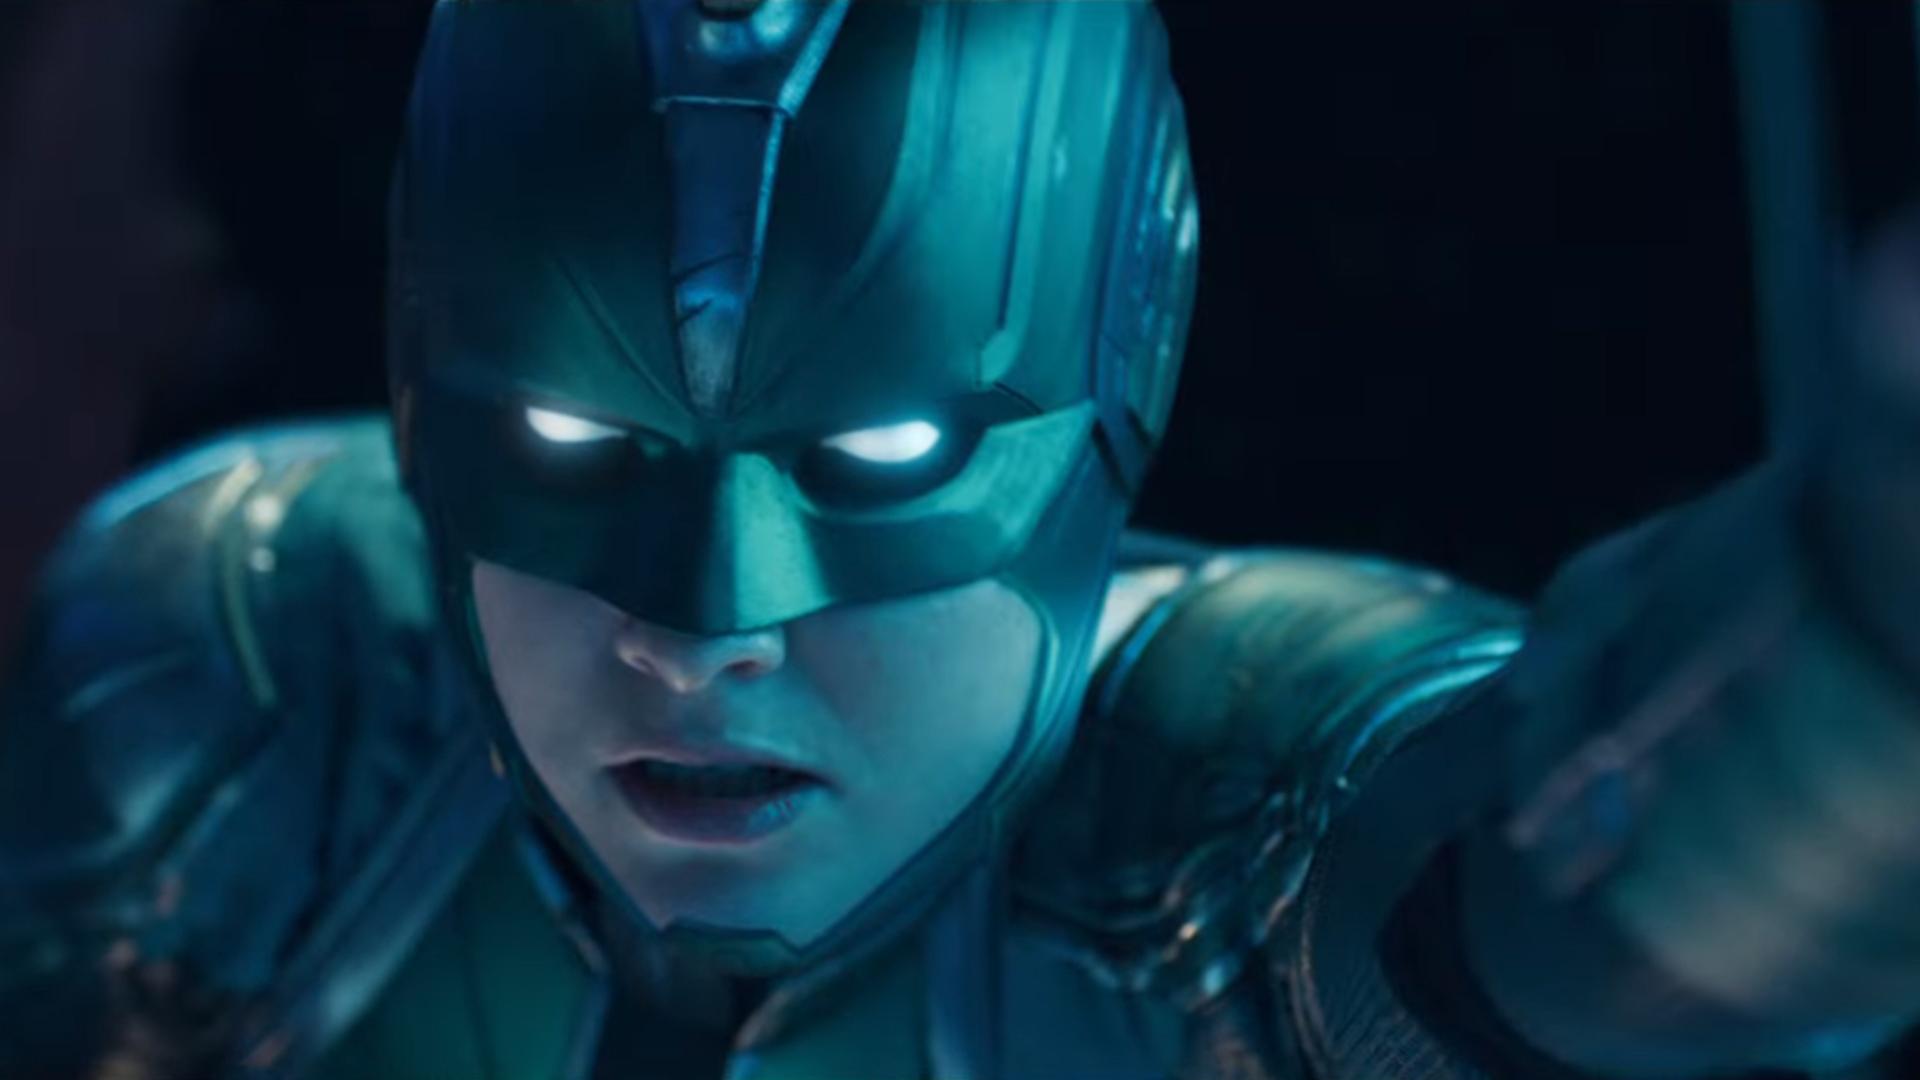 szmk_captain_marvel_kapitany_bosszuallok_avengers_22.jpg